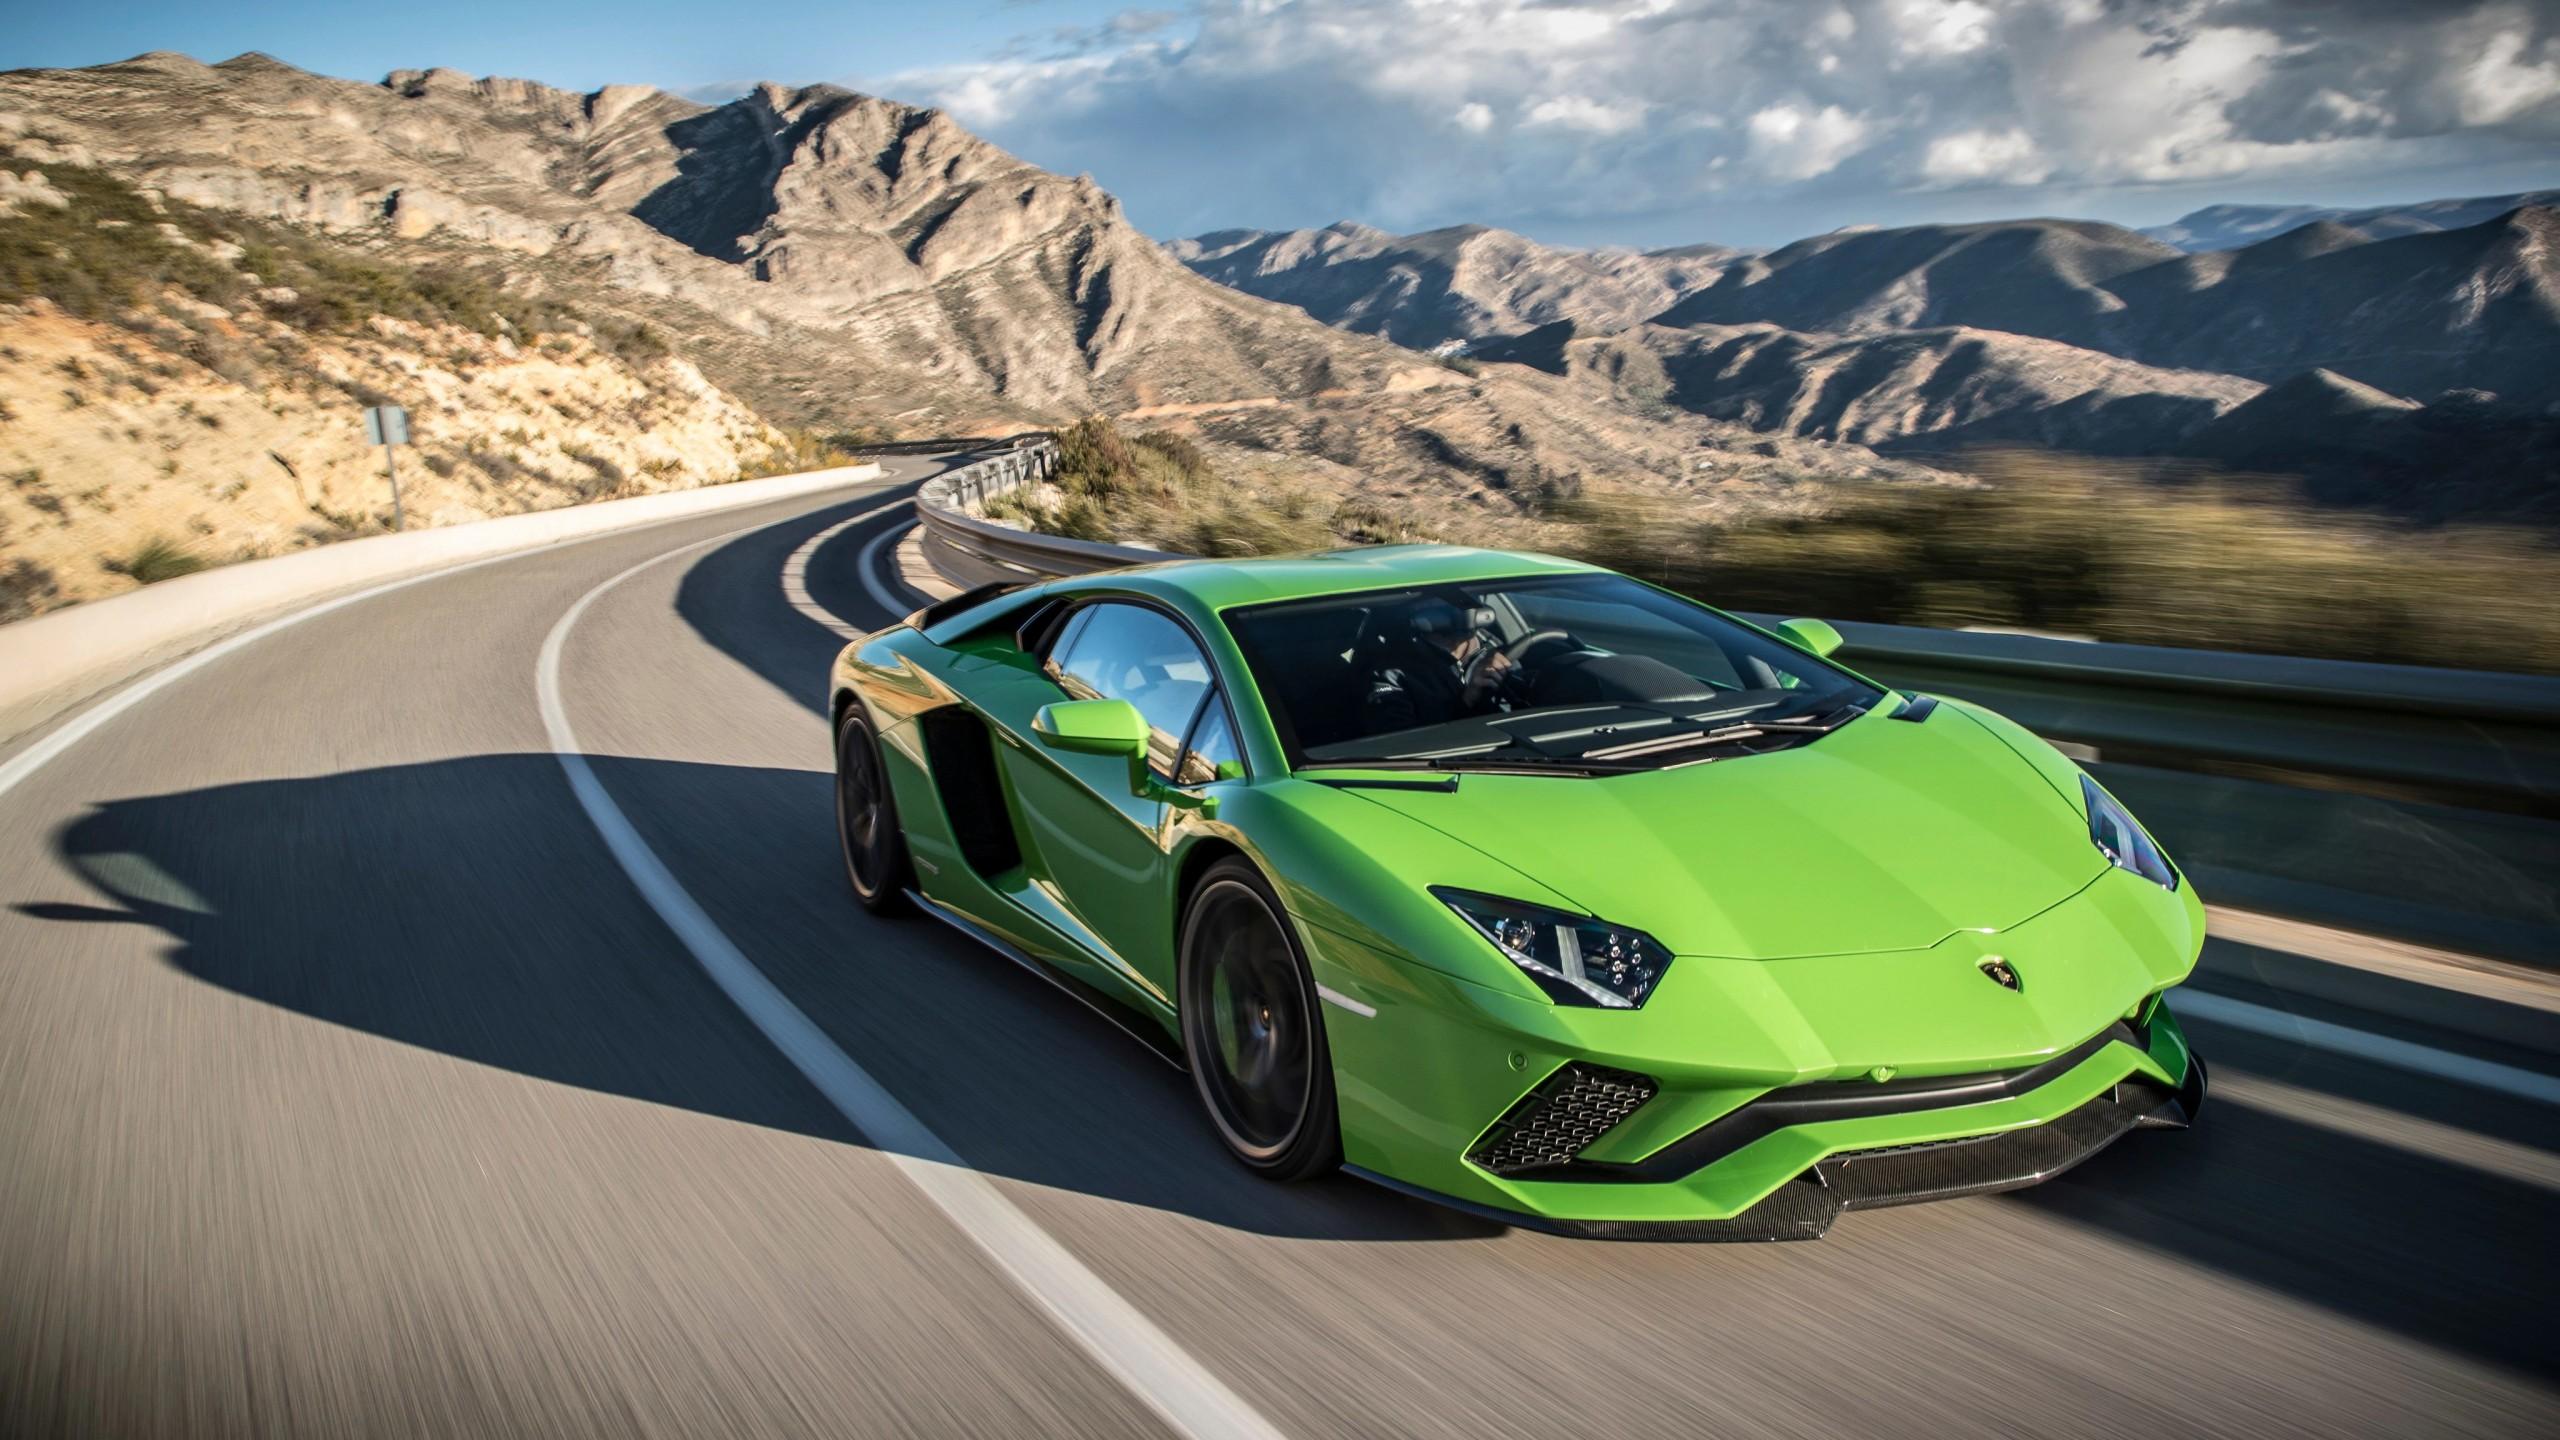 Lamborghini Aventador S 2017 4k Wallpaper Hd Car Wallpapers Id 8342